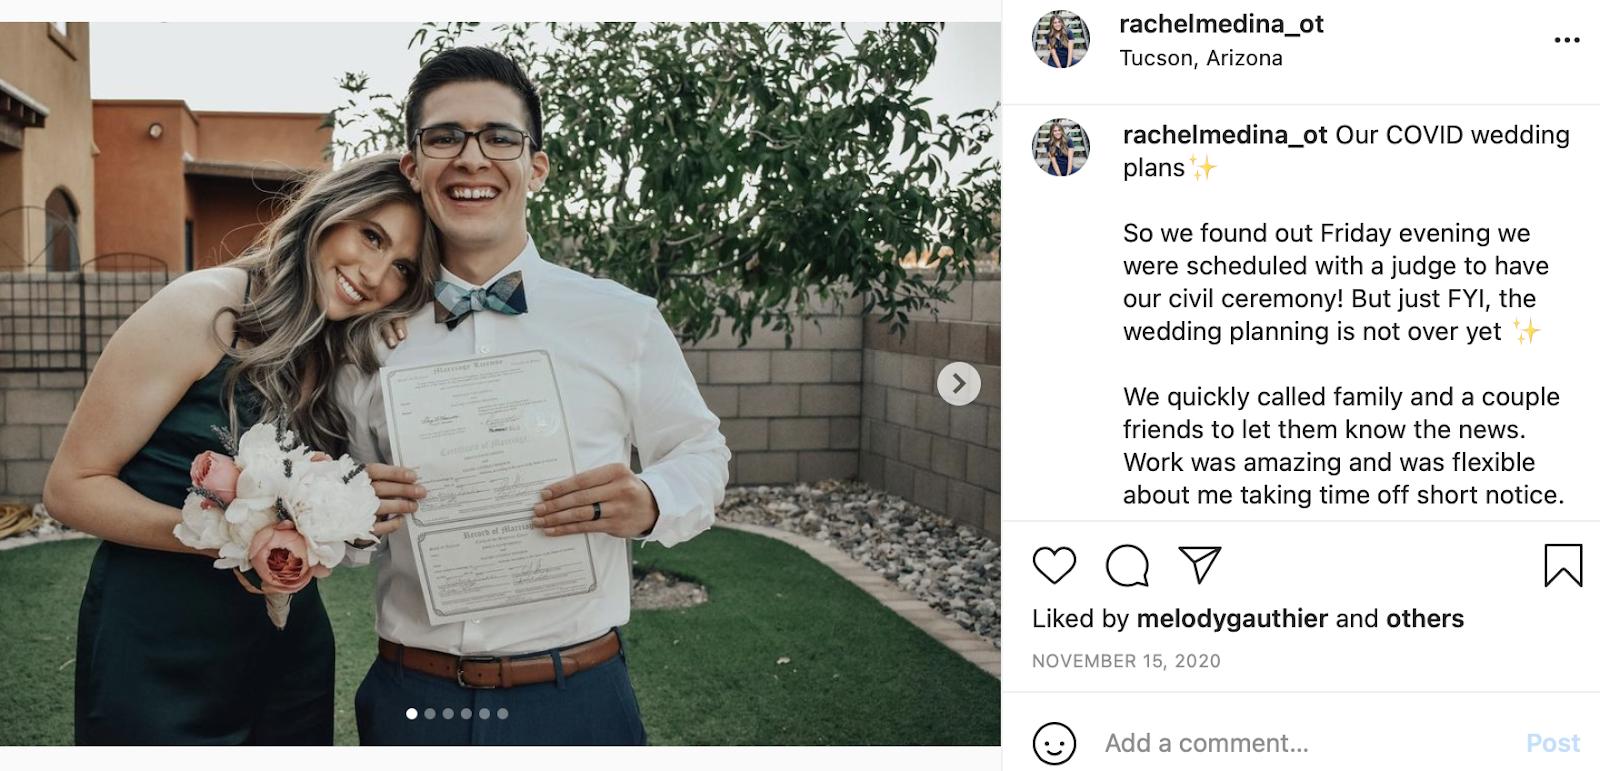 civil ceremony wedding photo and wedding instagram caption